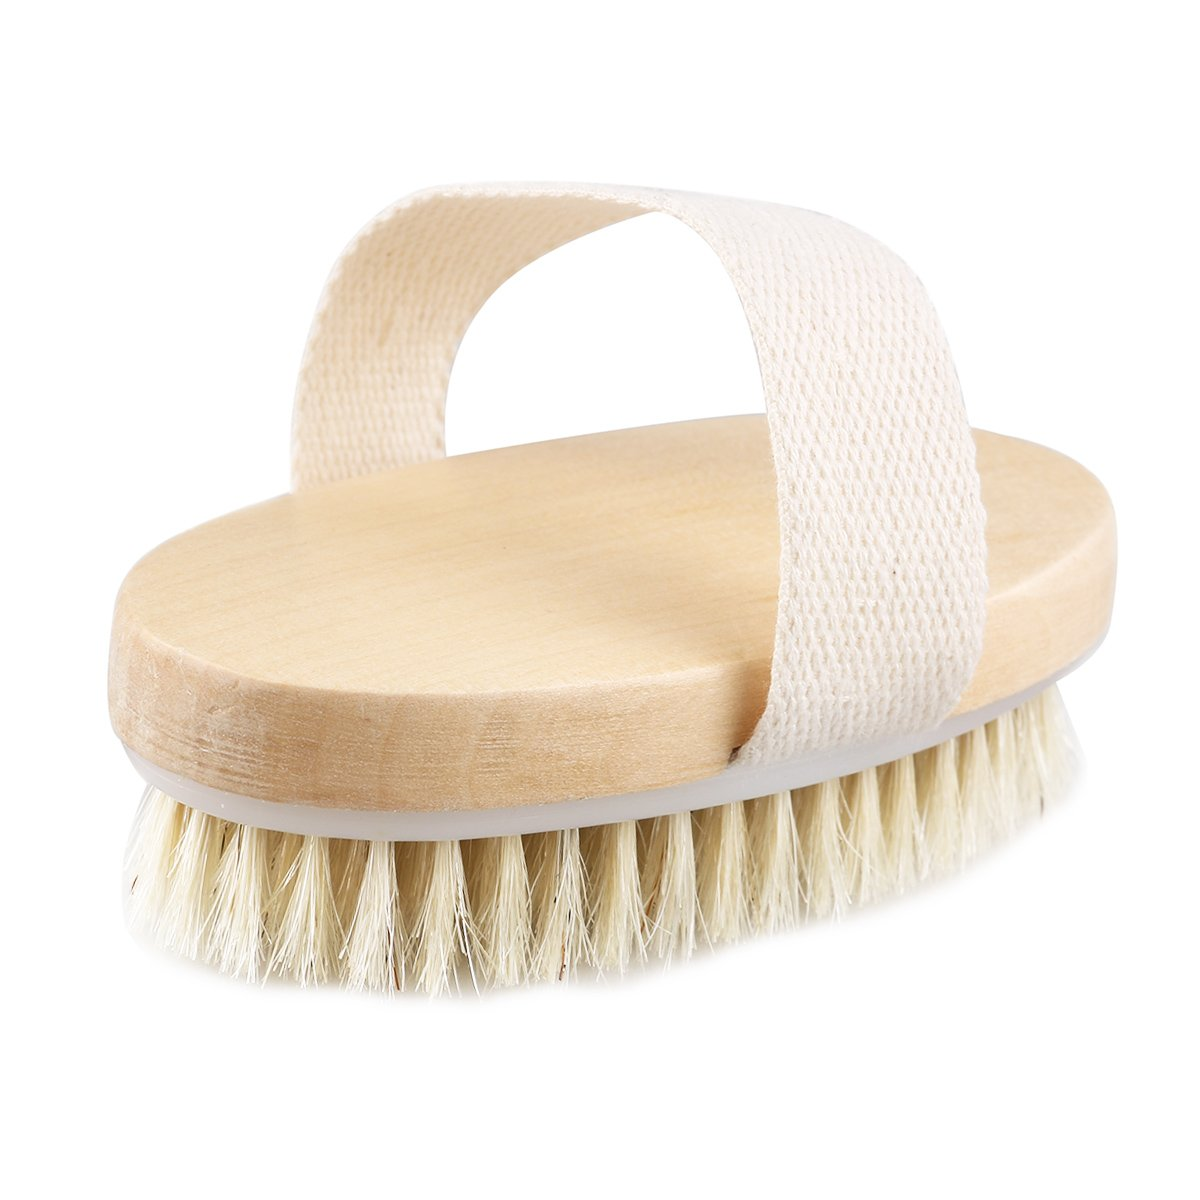 ULTNICE Holz Körperbürste Massagebürste Naturborsten ohne Griff